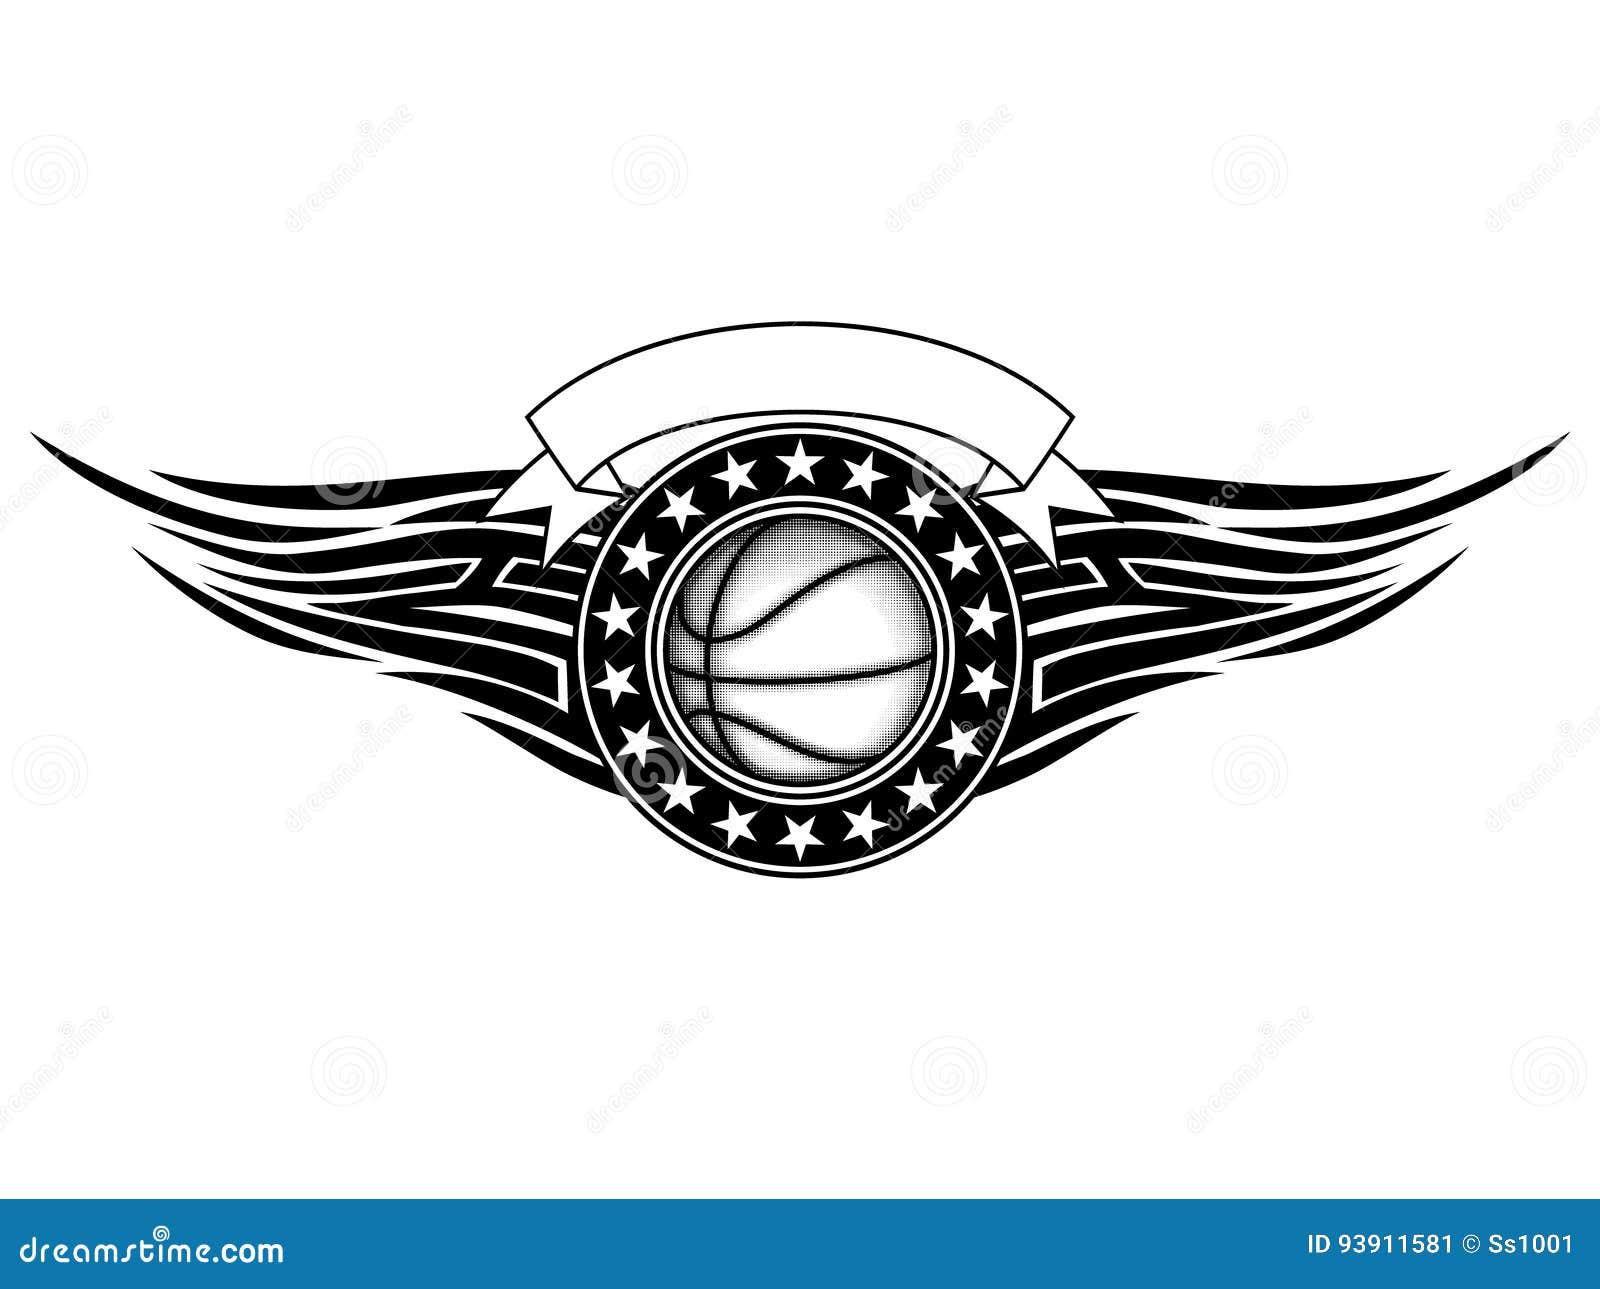 Basketball Tribal Stock Vector Illustration Of American 93911581,Lehenga Blouse Designs 2020 Front